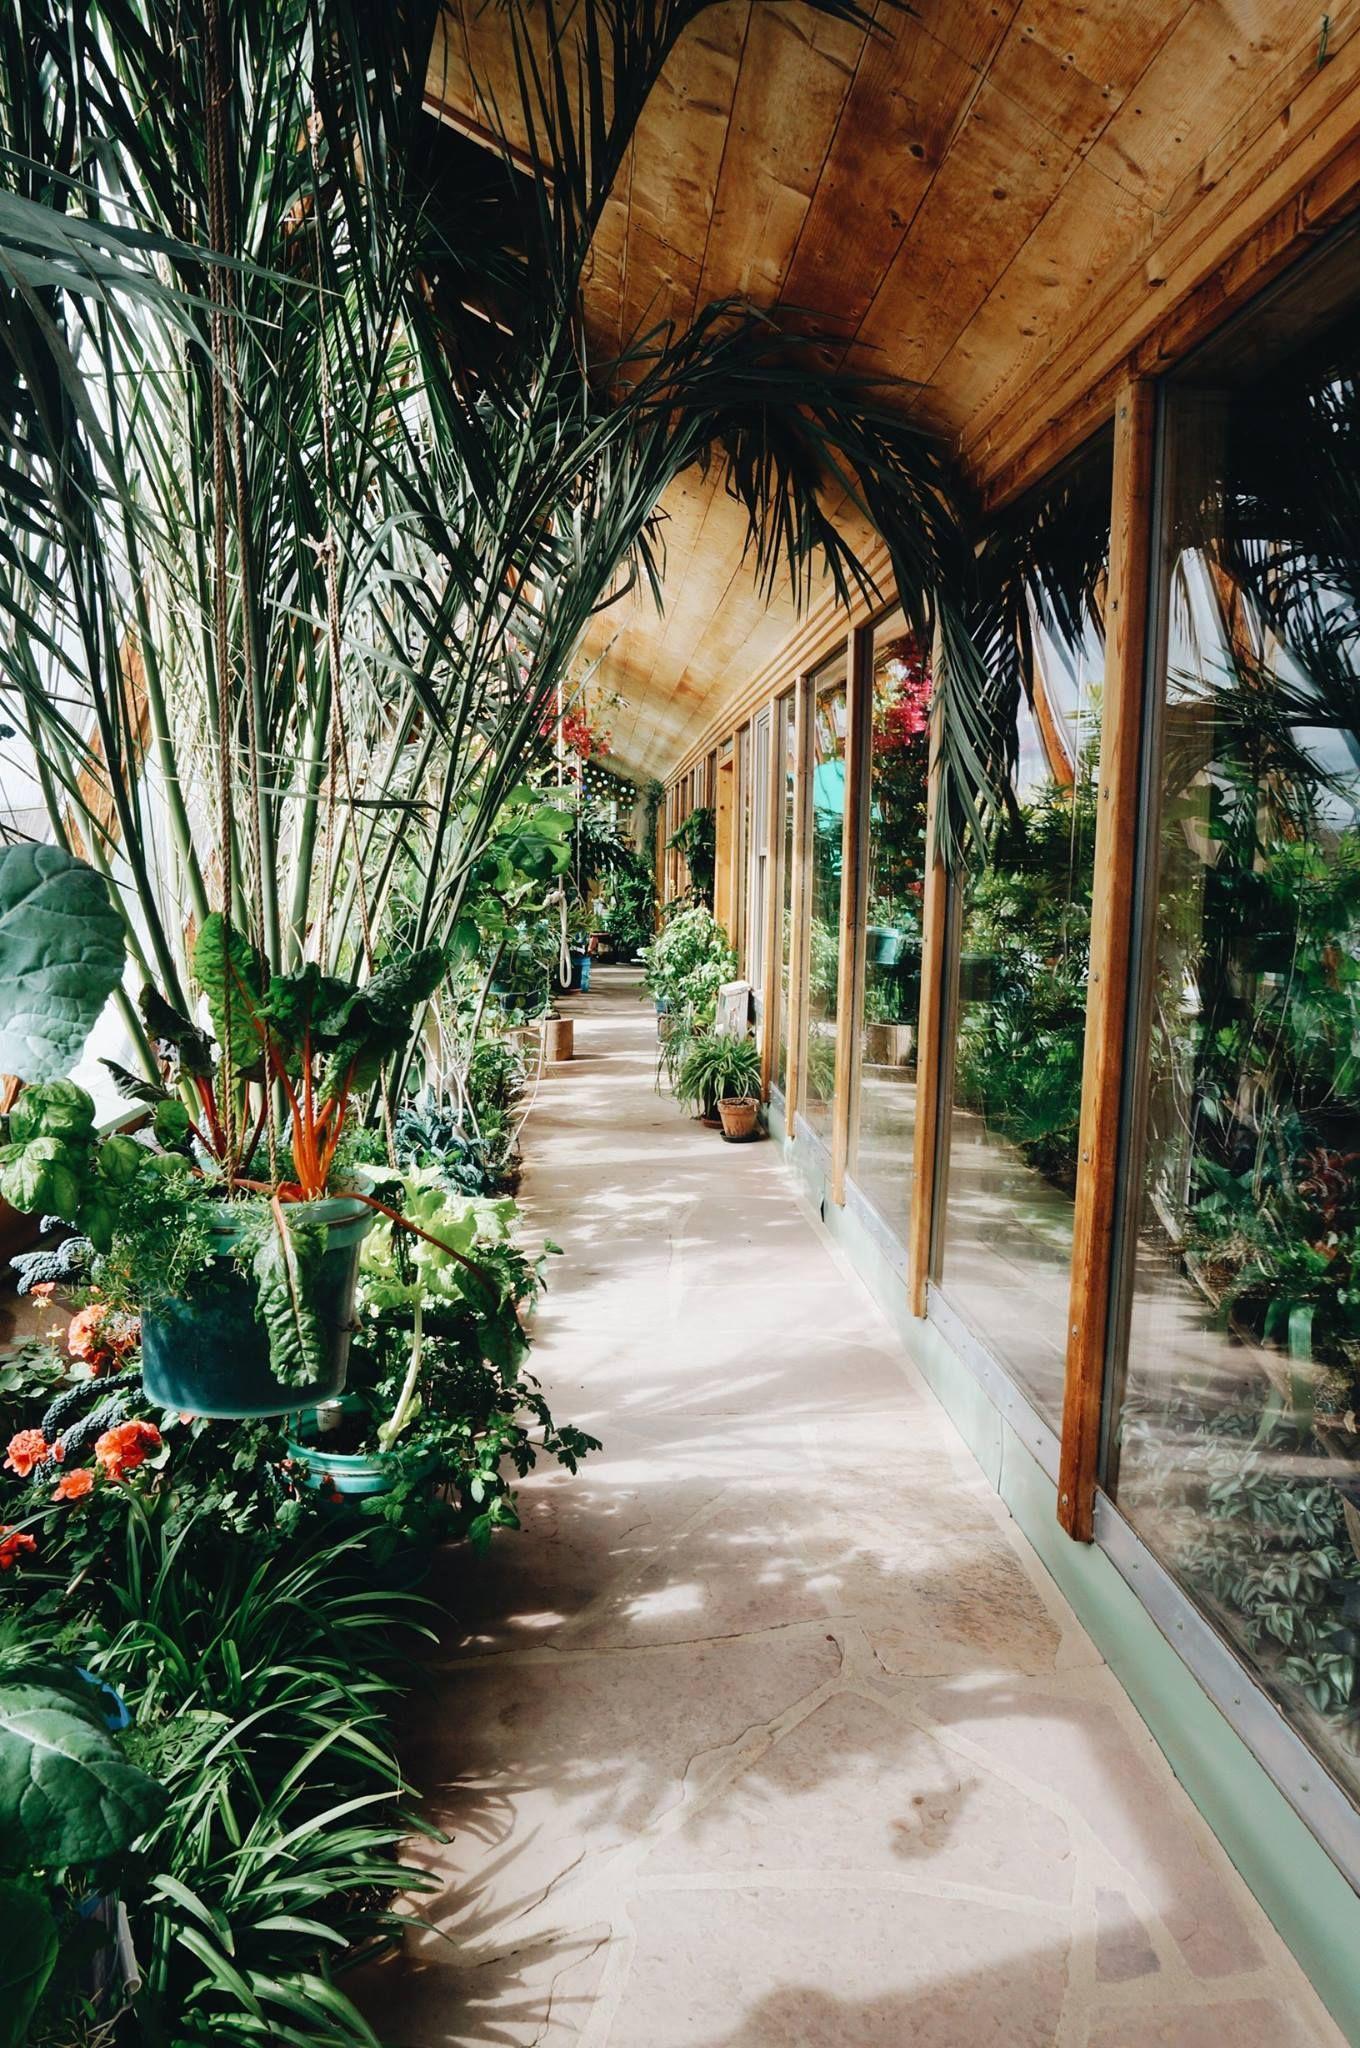 Pin On Indoors: Earthship Home, Earthship, Indoor Garden